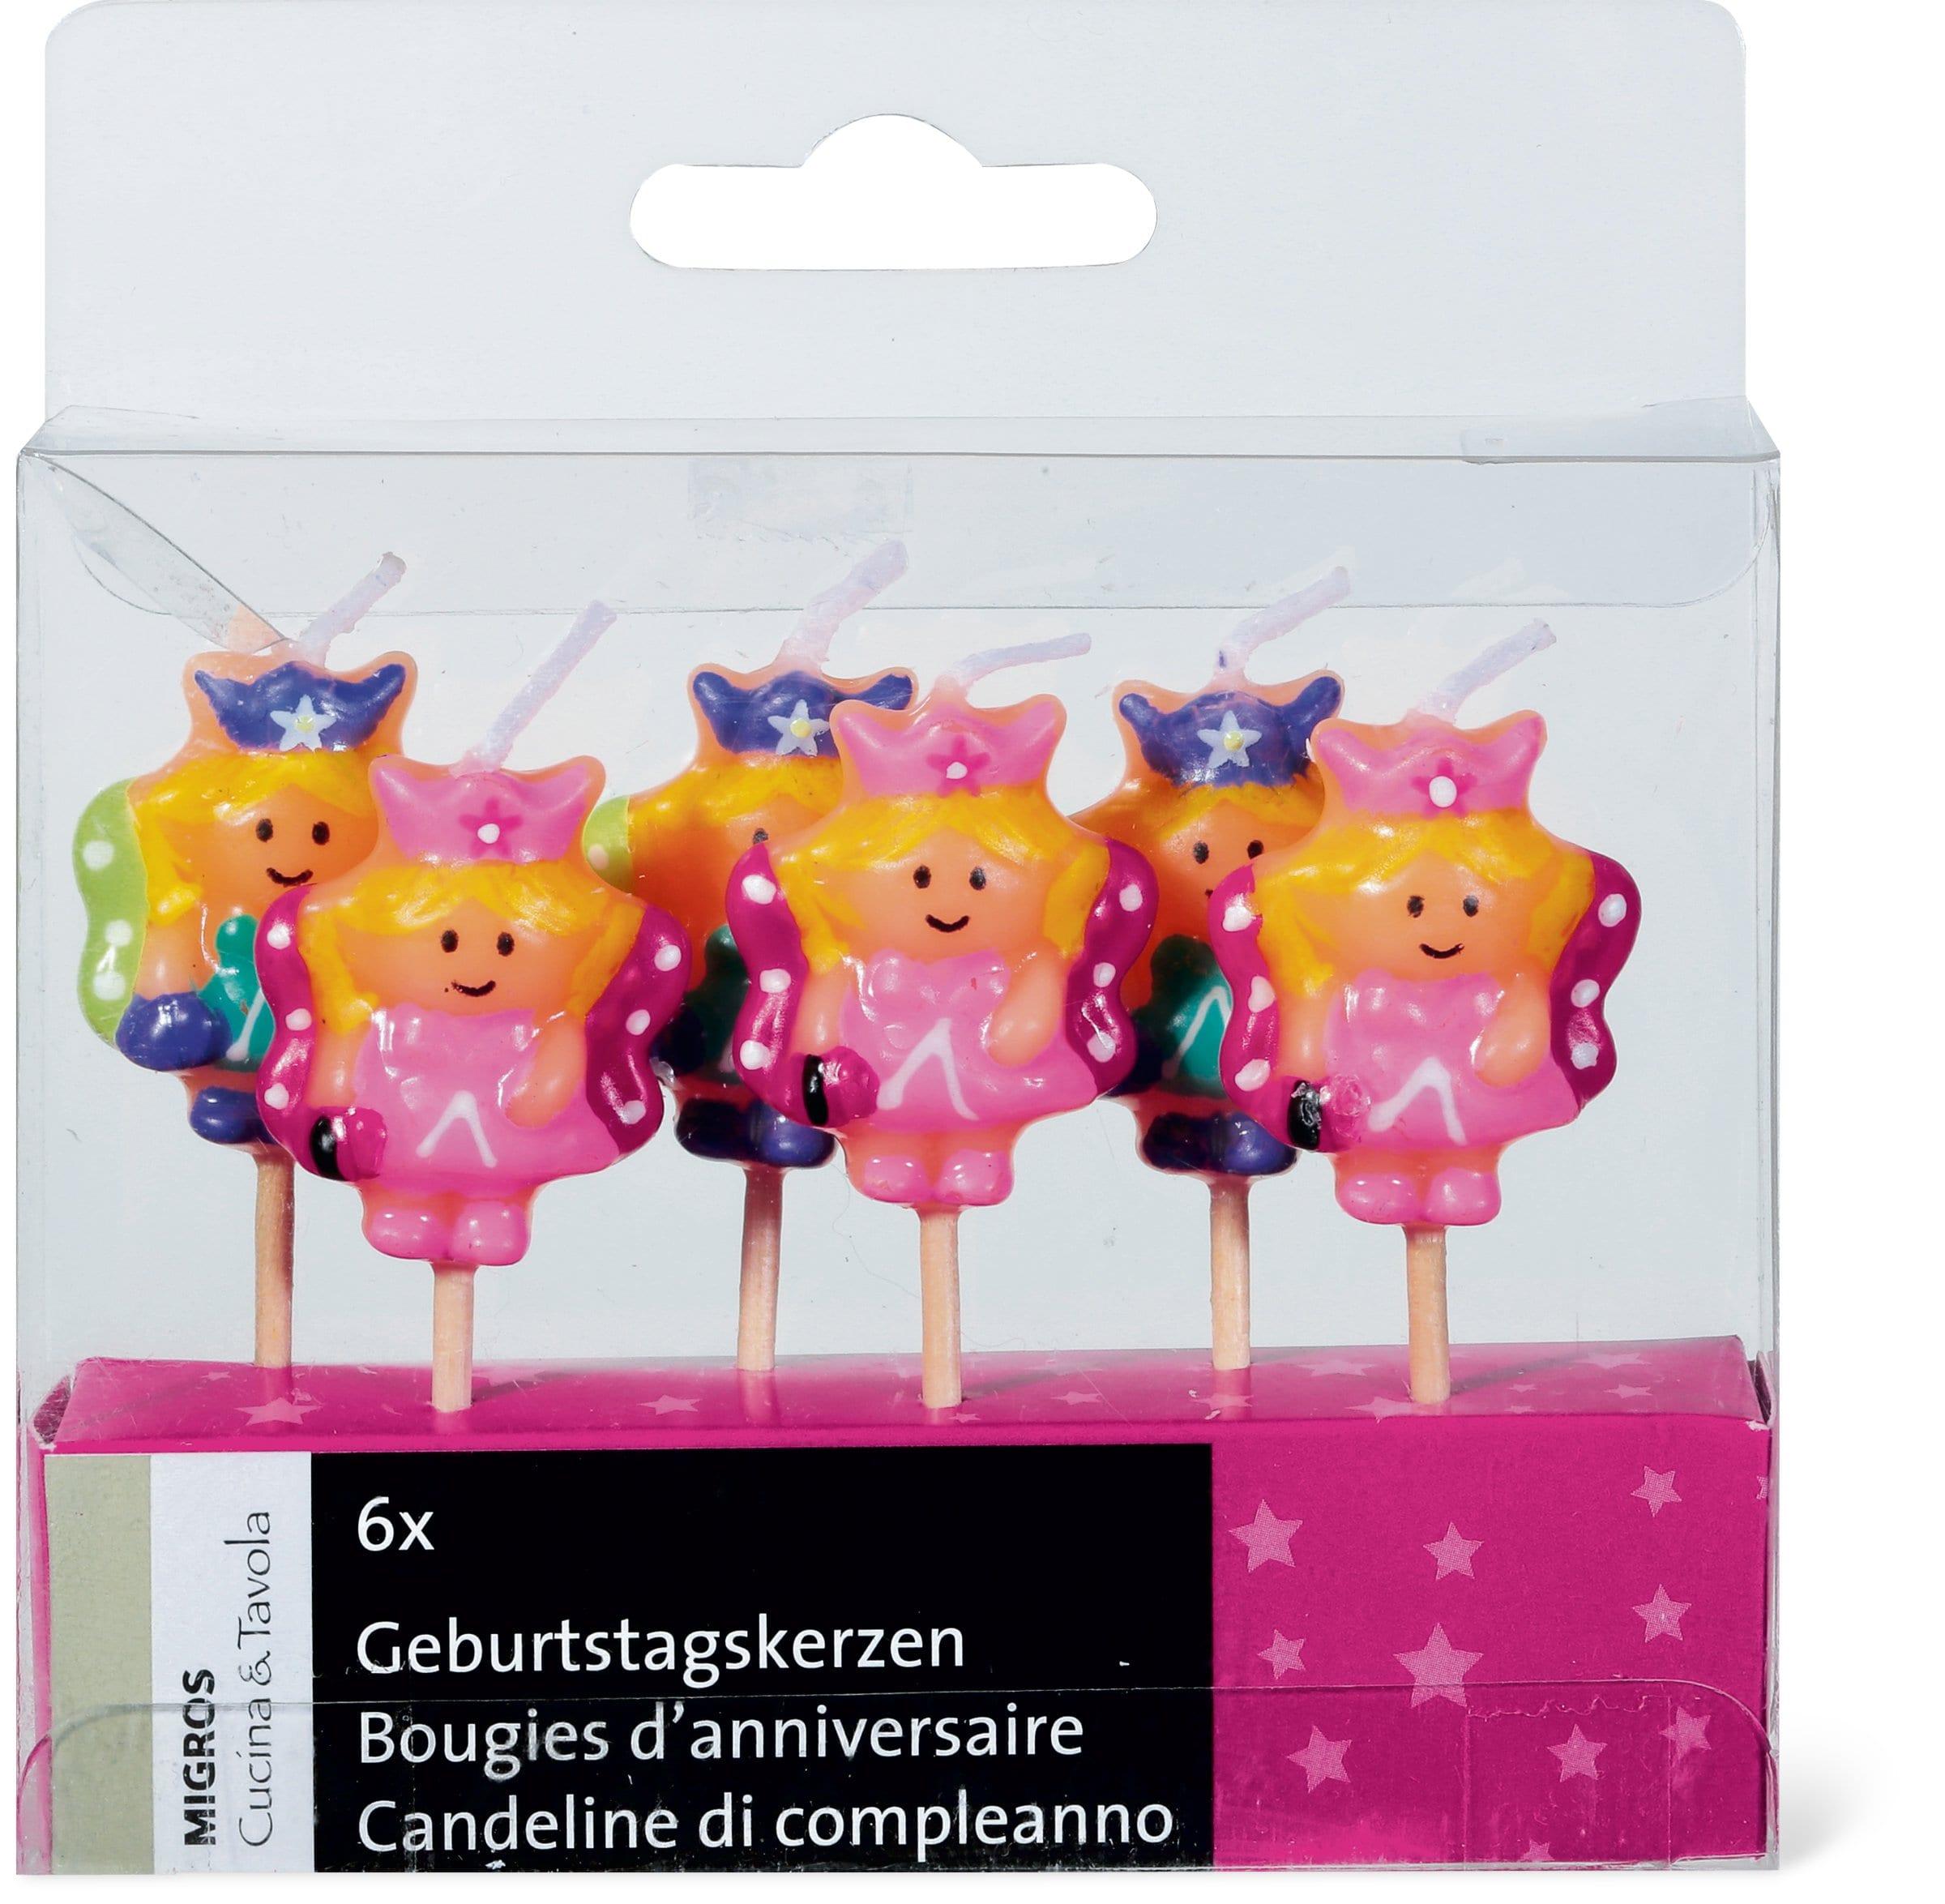 Cucina & Tavola Bougies d'anniversaire